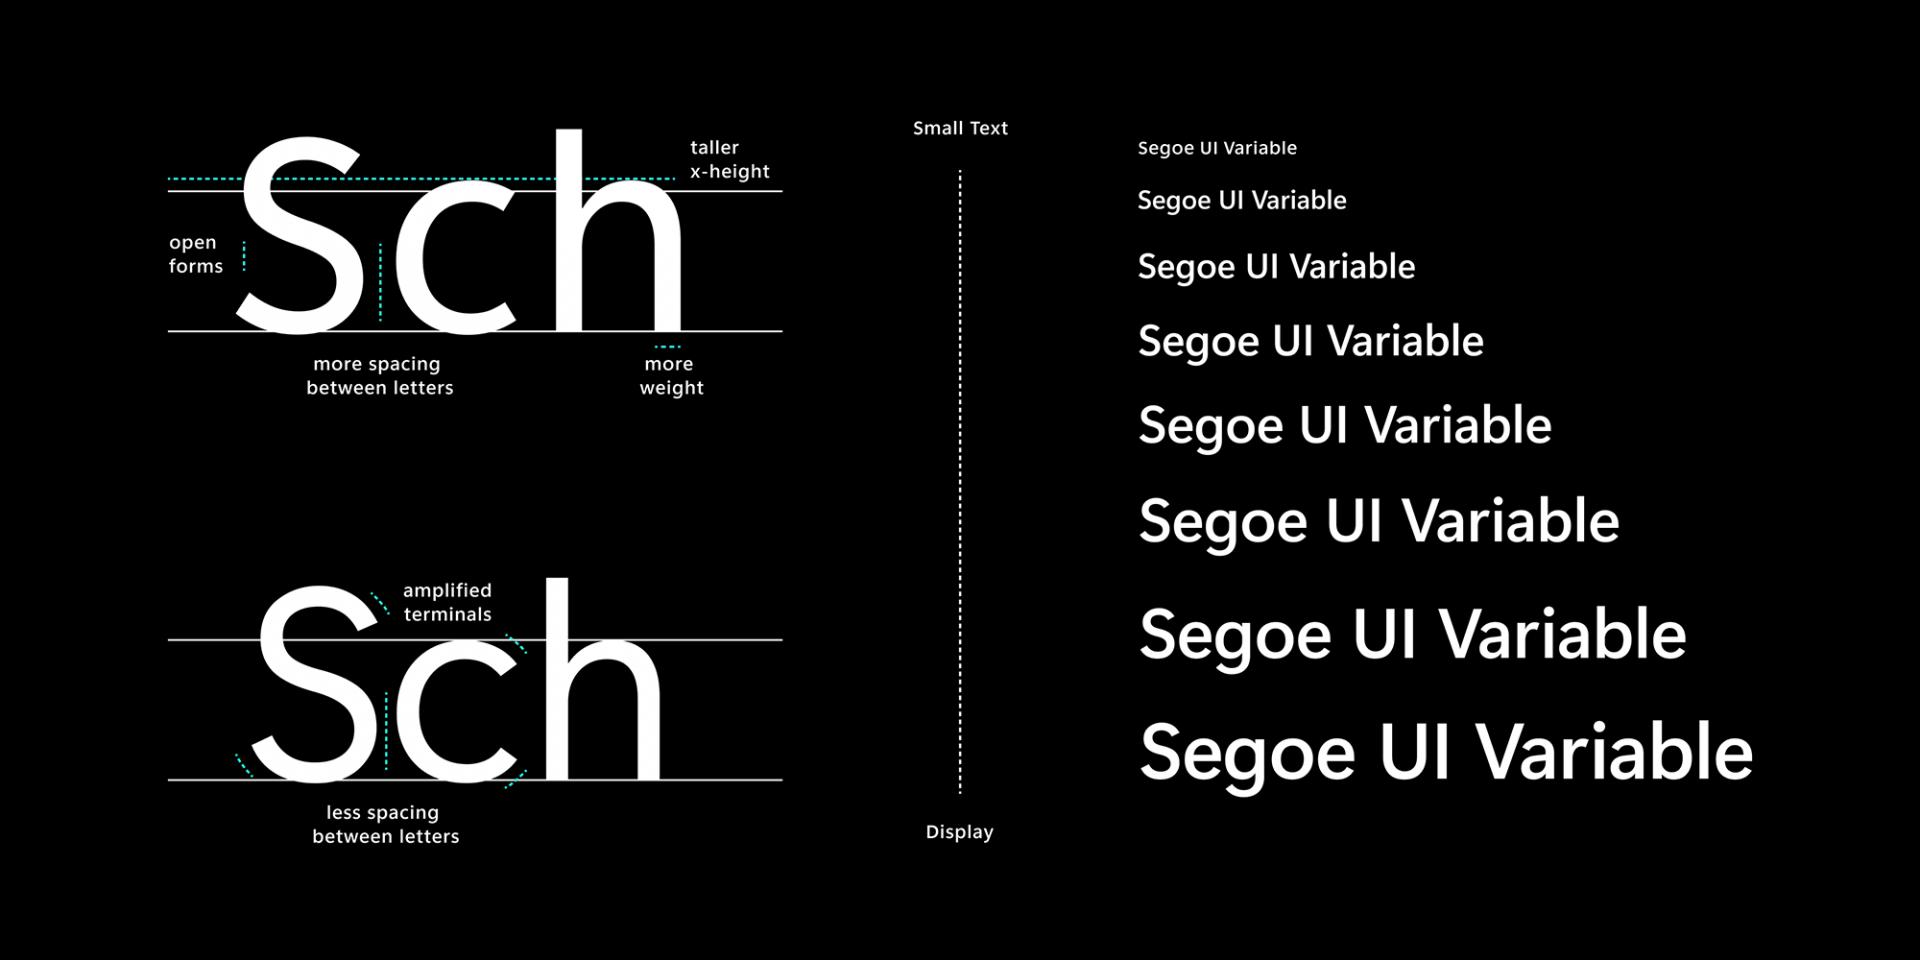 segoe-variable.png